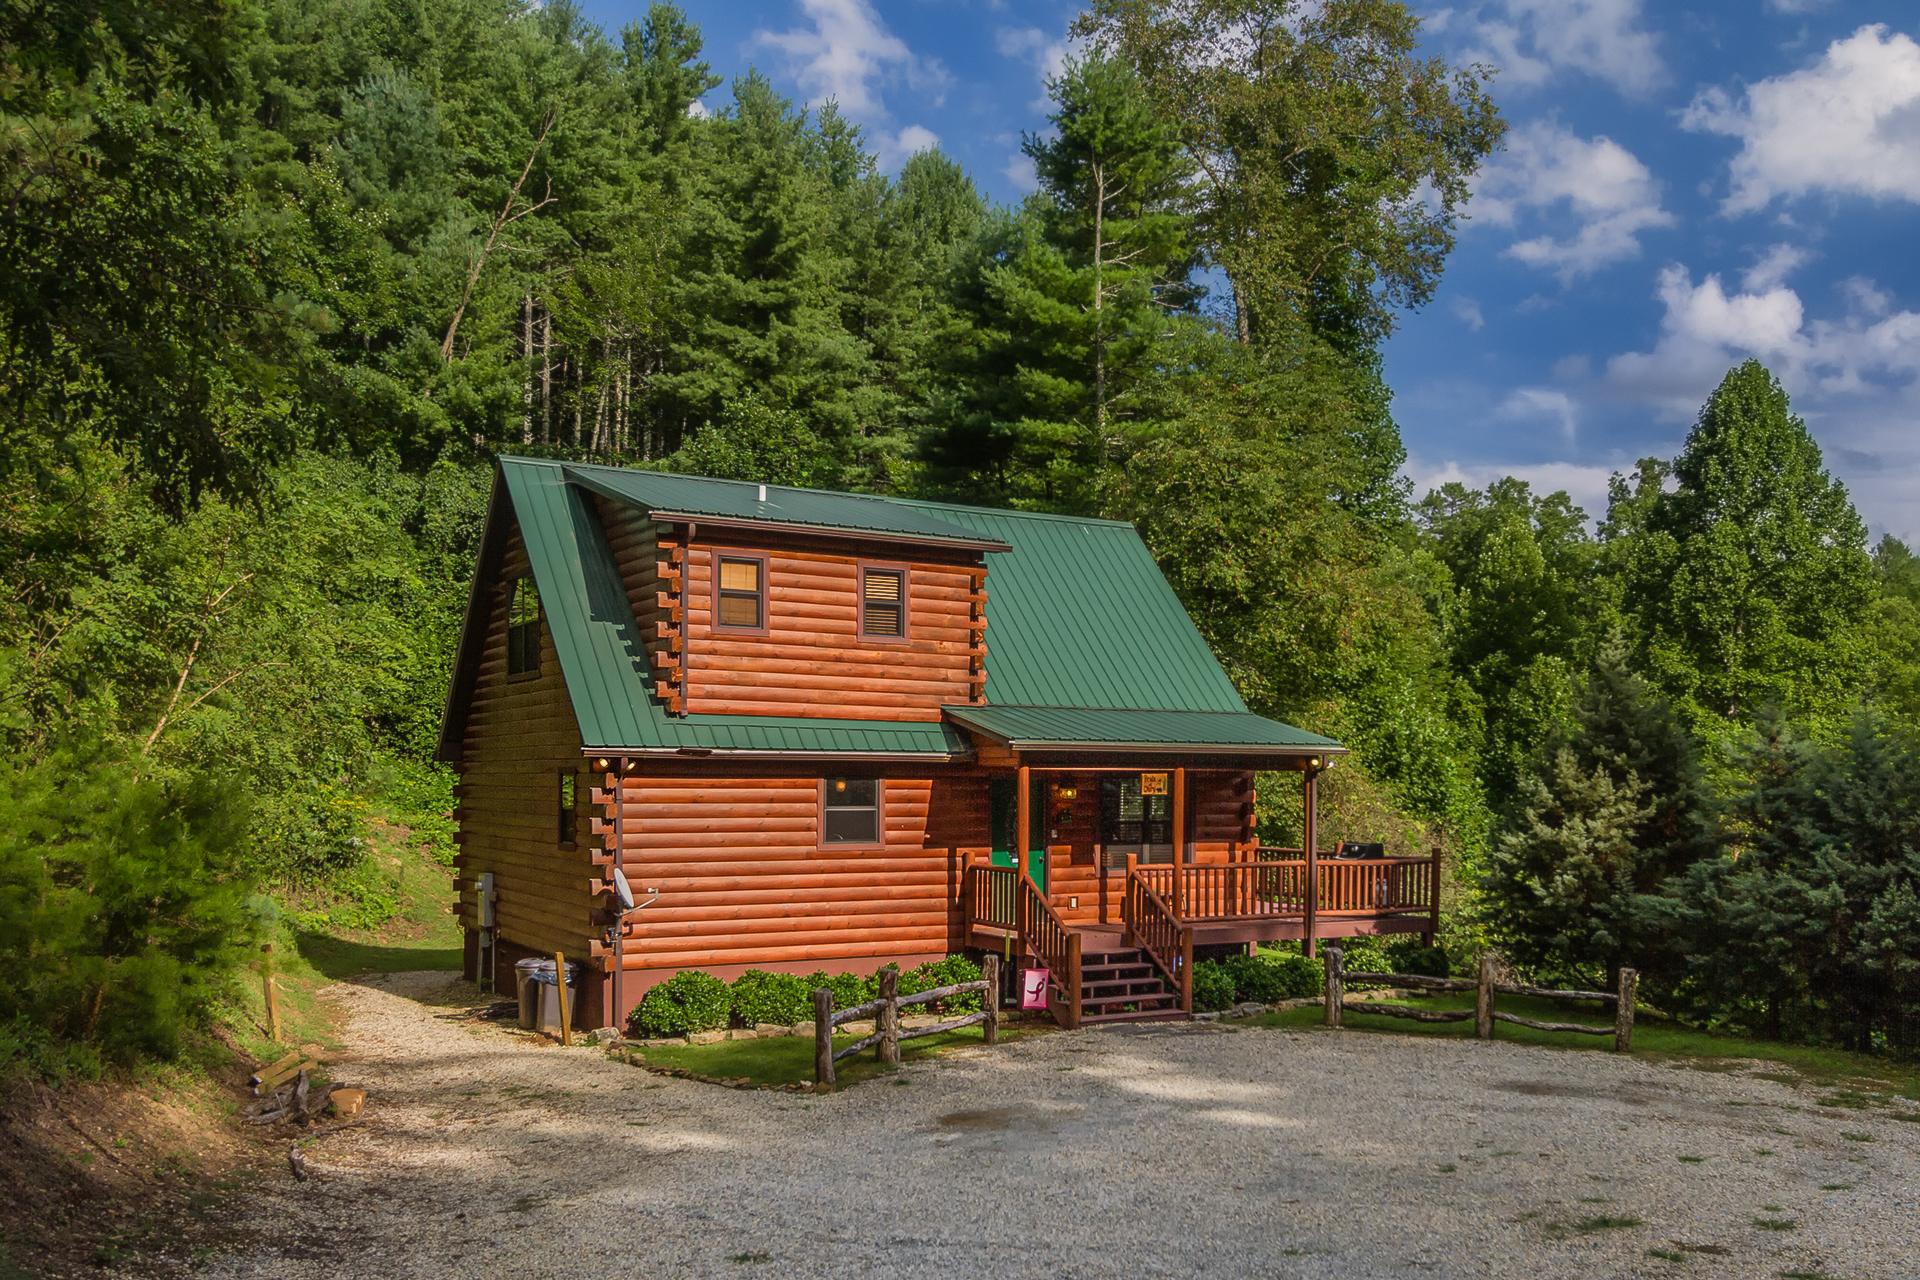 Pride of glory log cabin vacation rental 2 bedroom - 4 bedroom cabins in north carolina ...